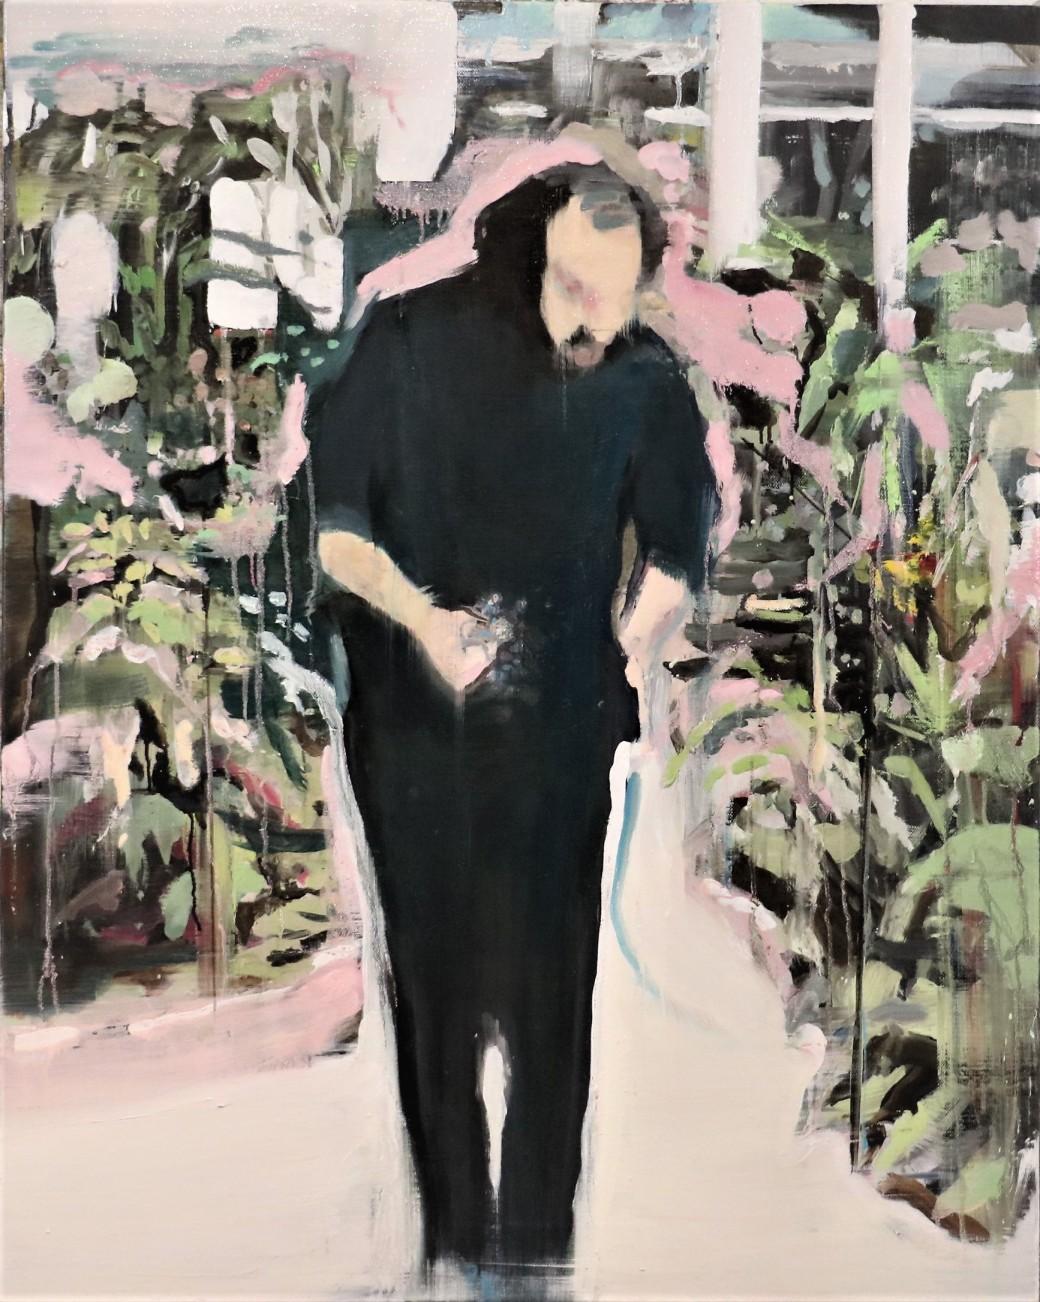 Nico Vaerewijck, #Artis, 80x100 cm, oil on linen,  2018